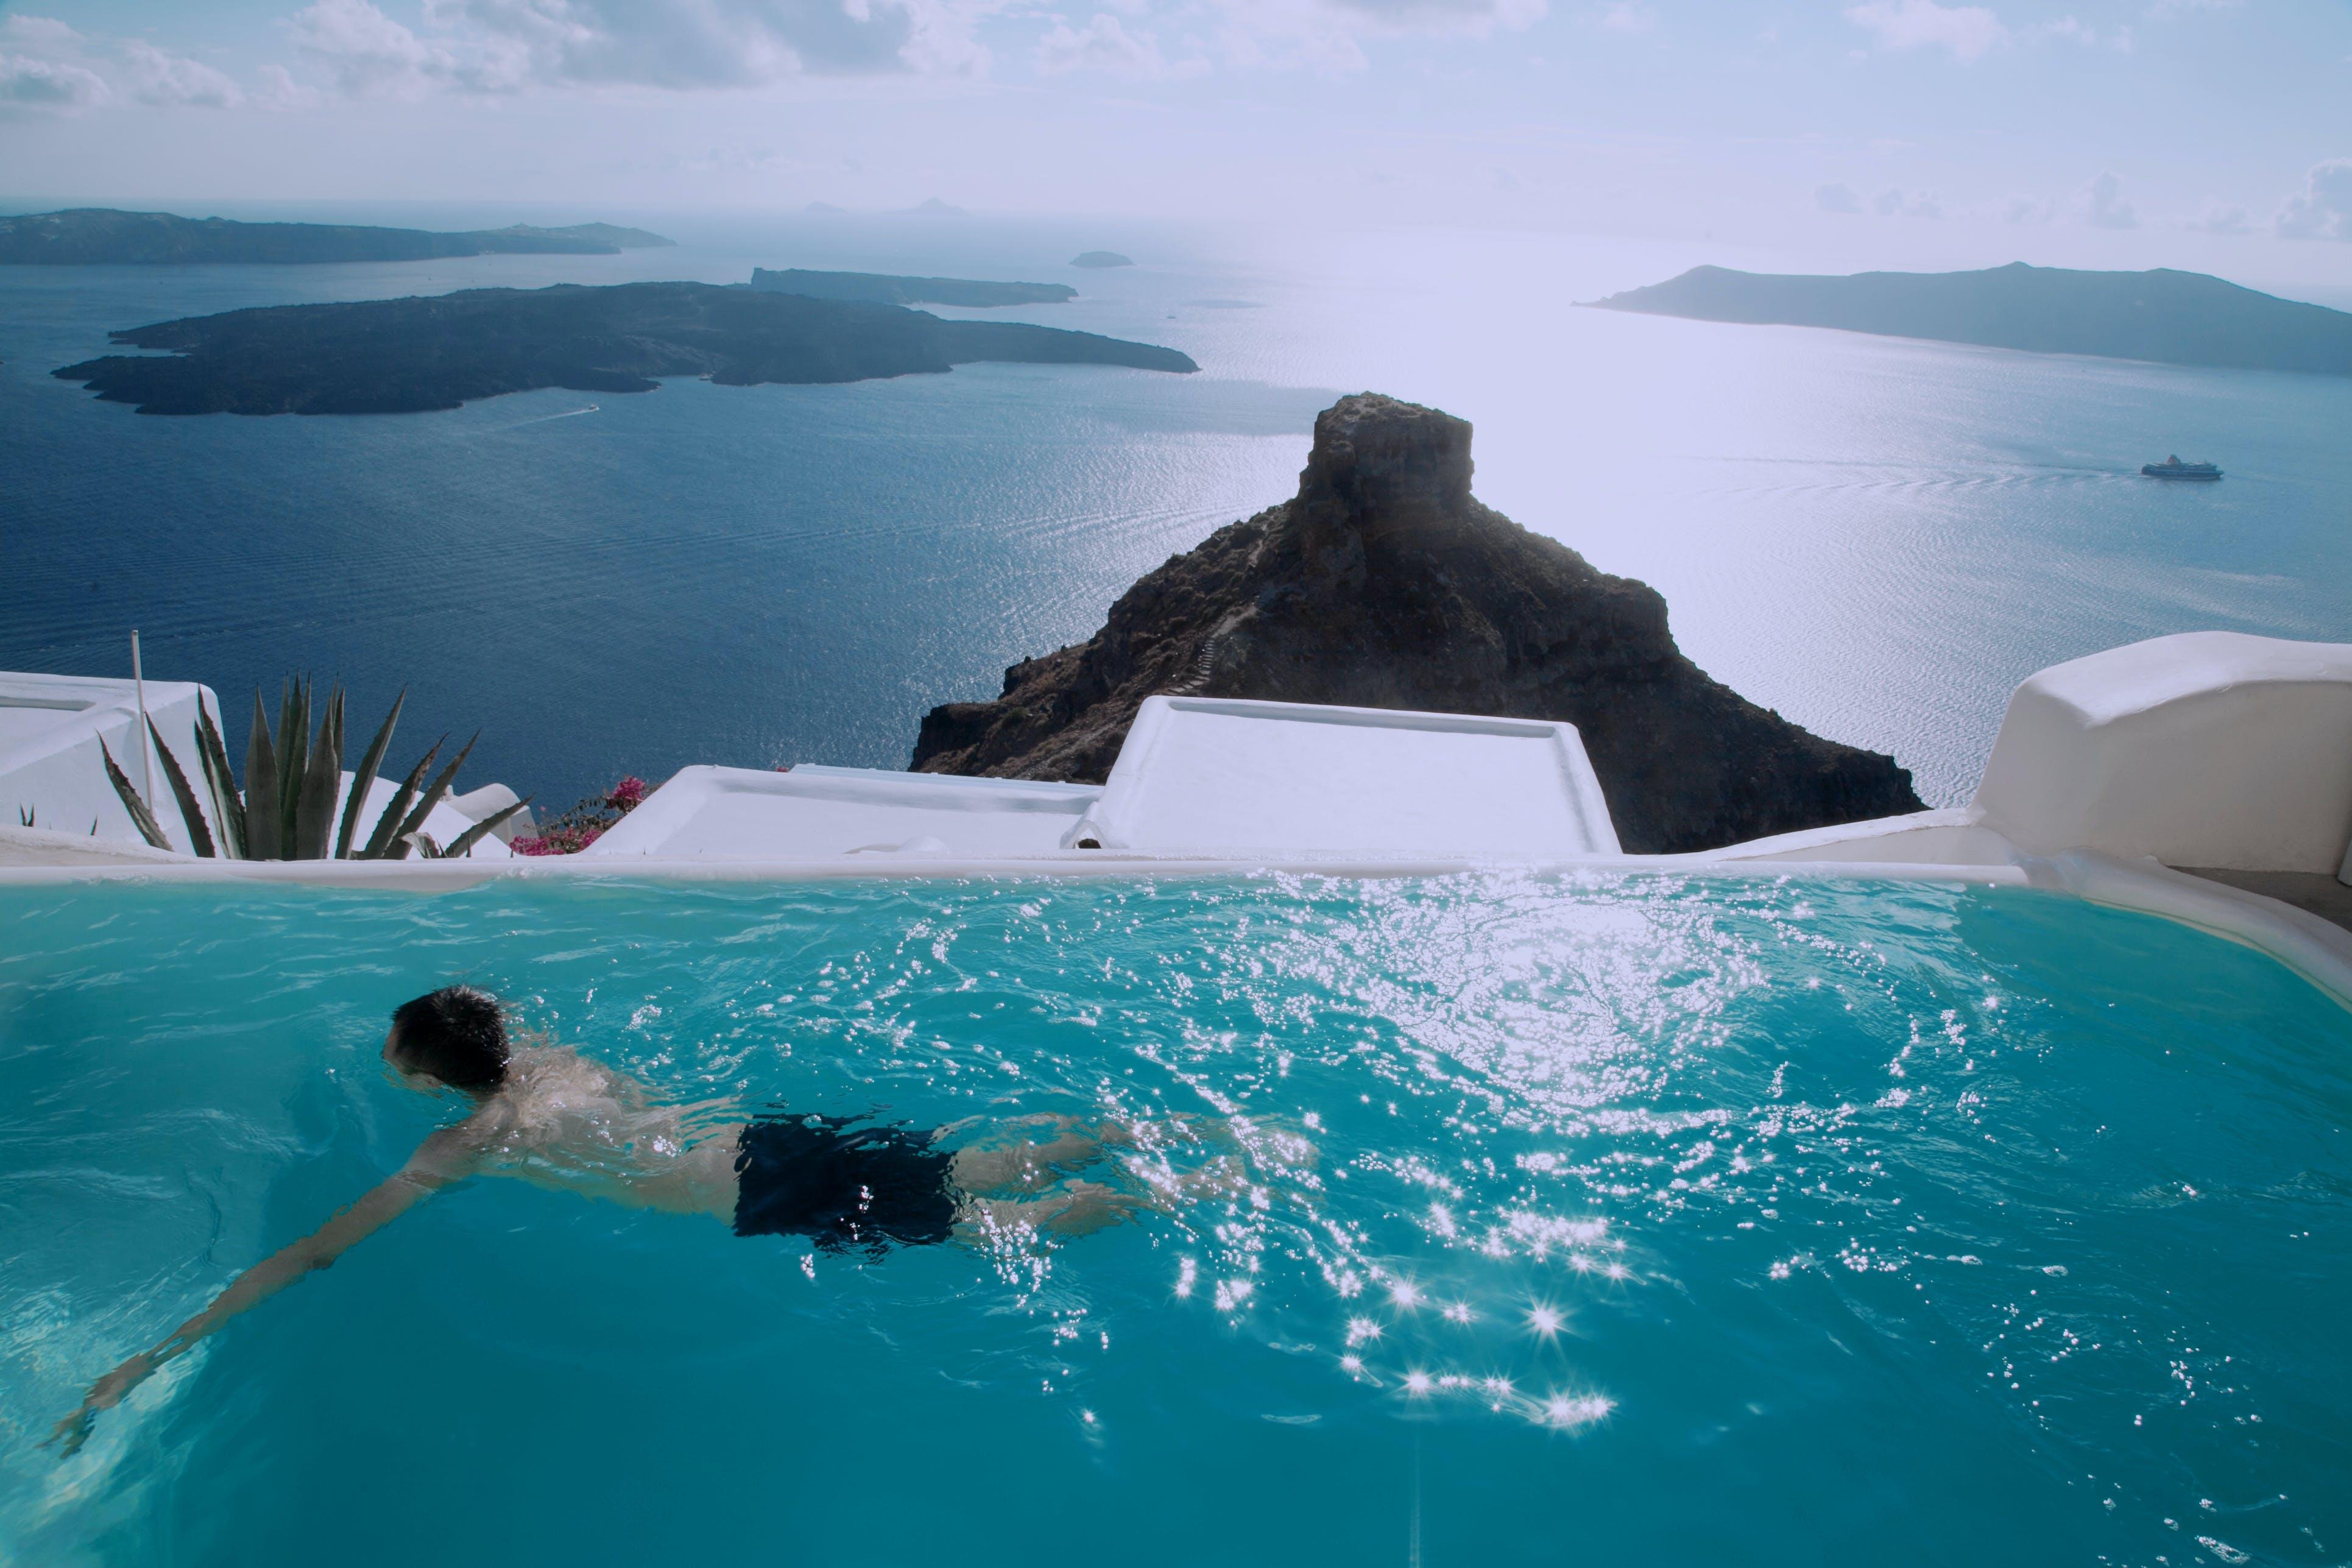 Man Wearing Black Shorts Swimming in Infinity Pool